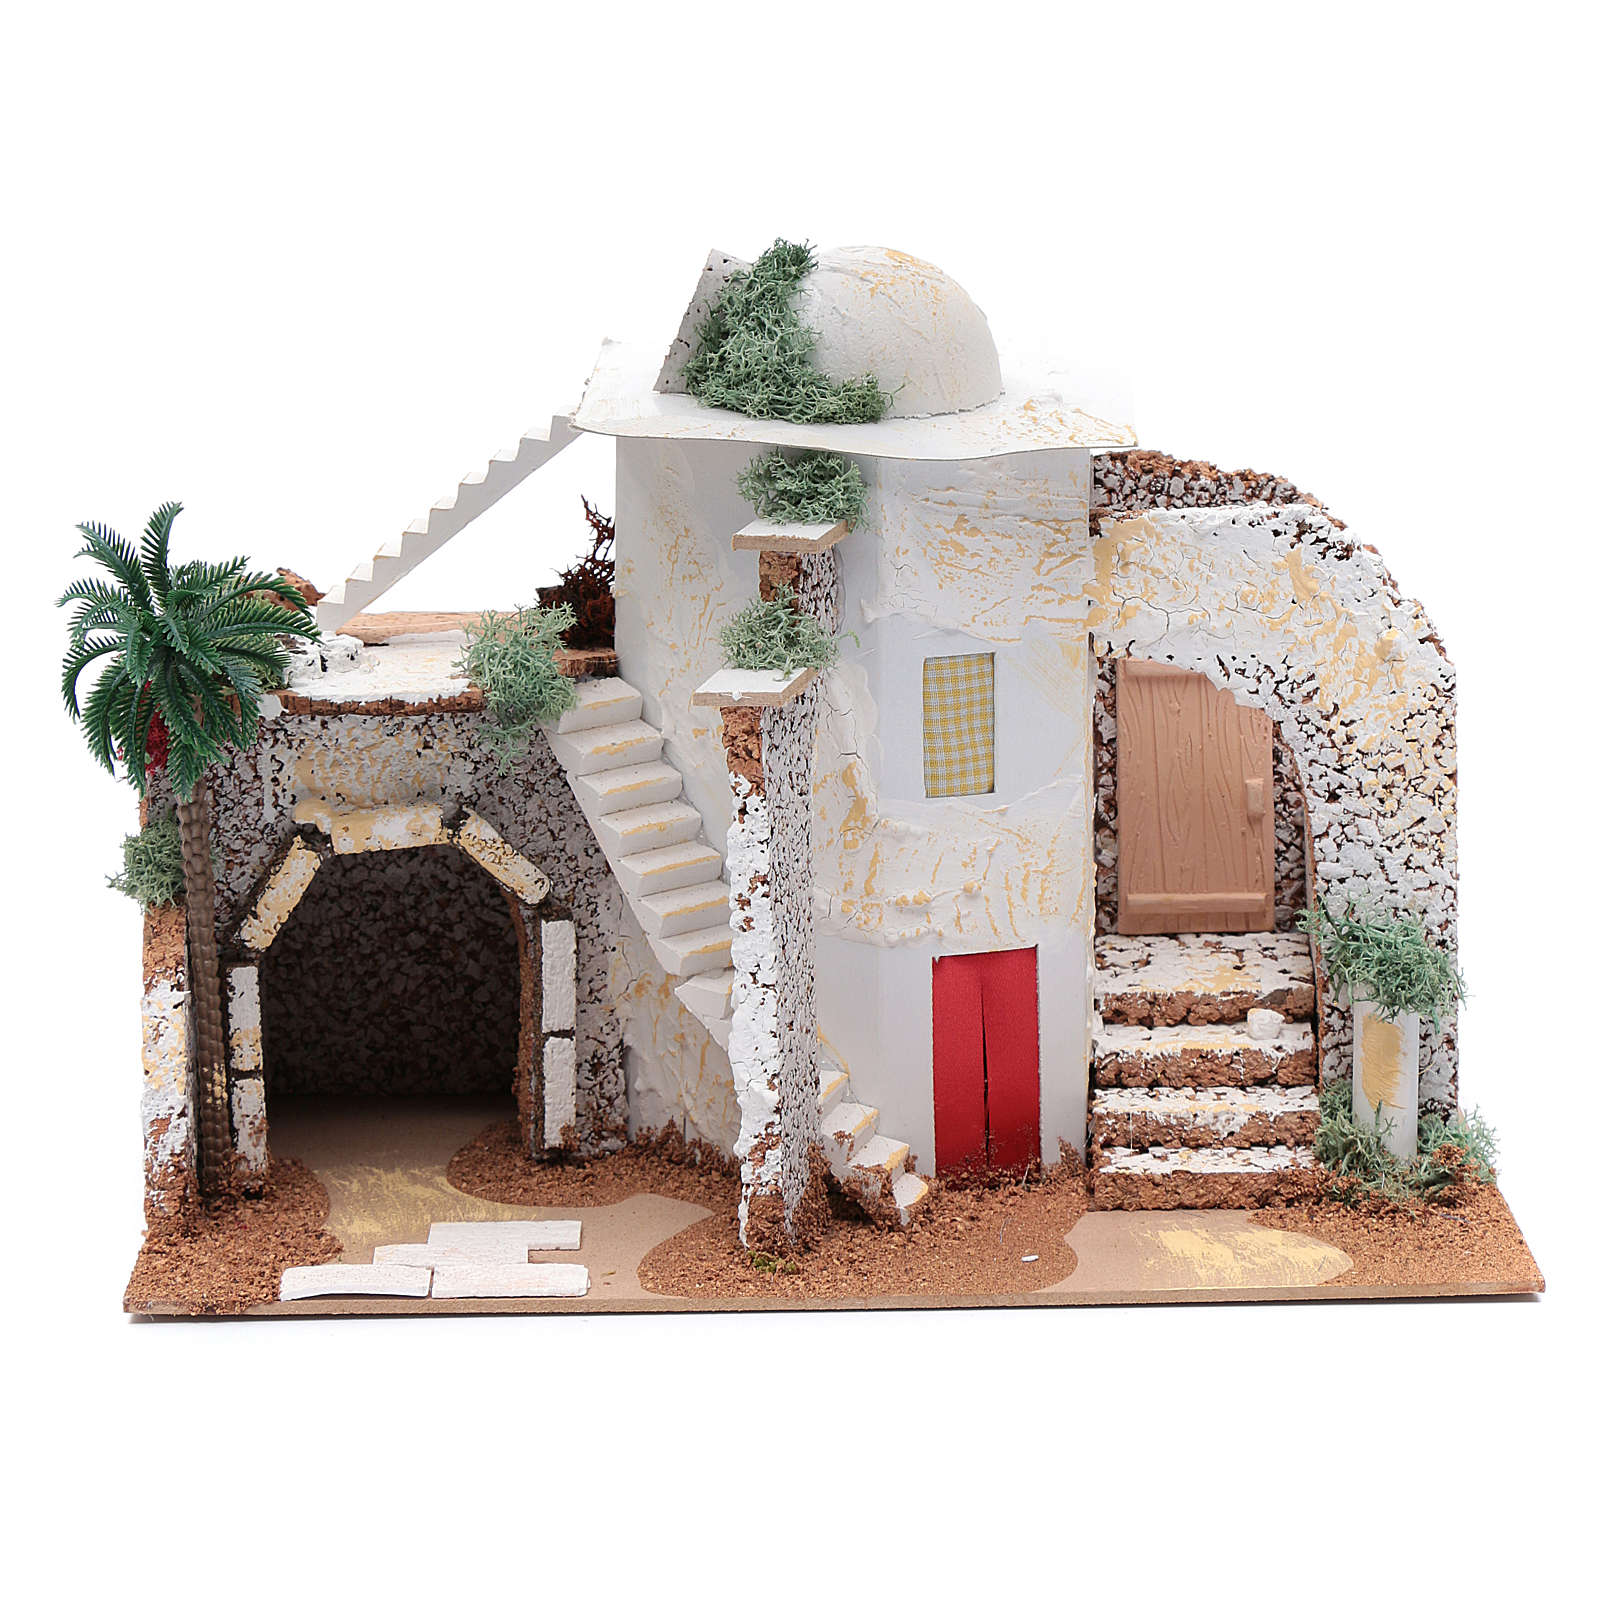 Casa araba ambientazione presepe 25x33x15 cm 4